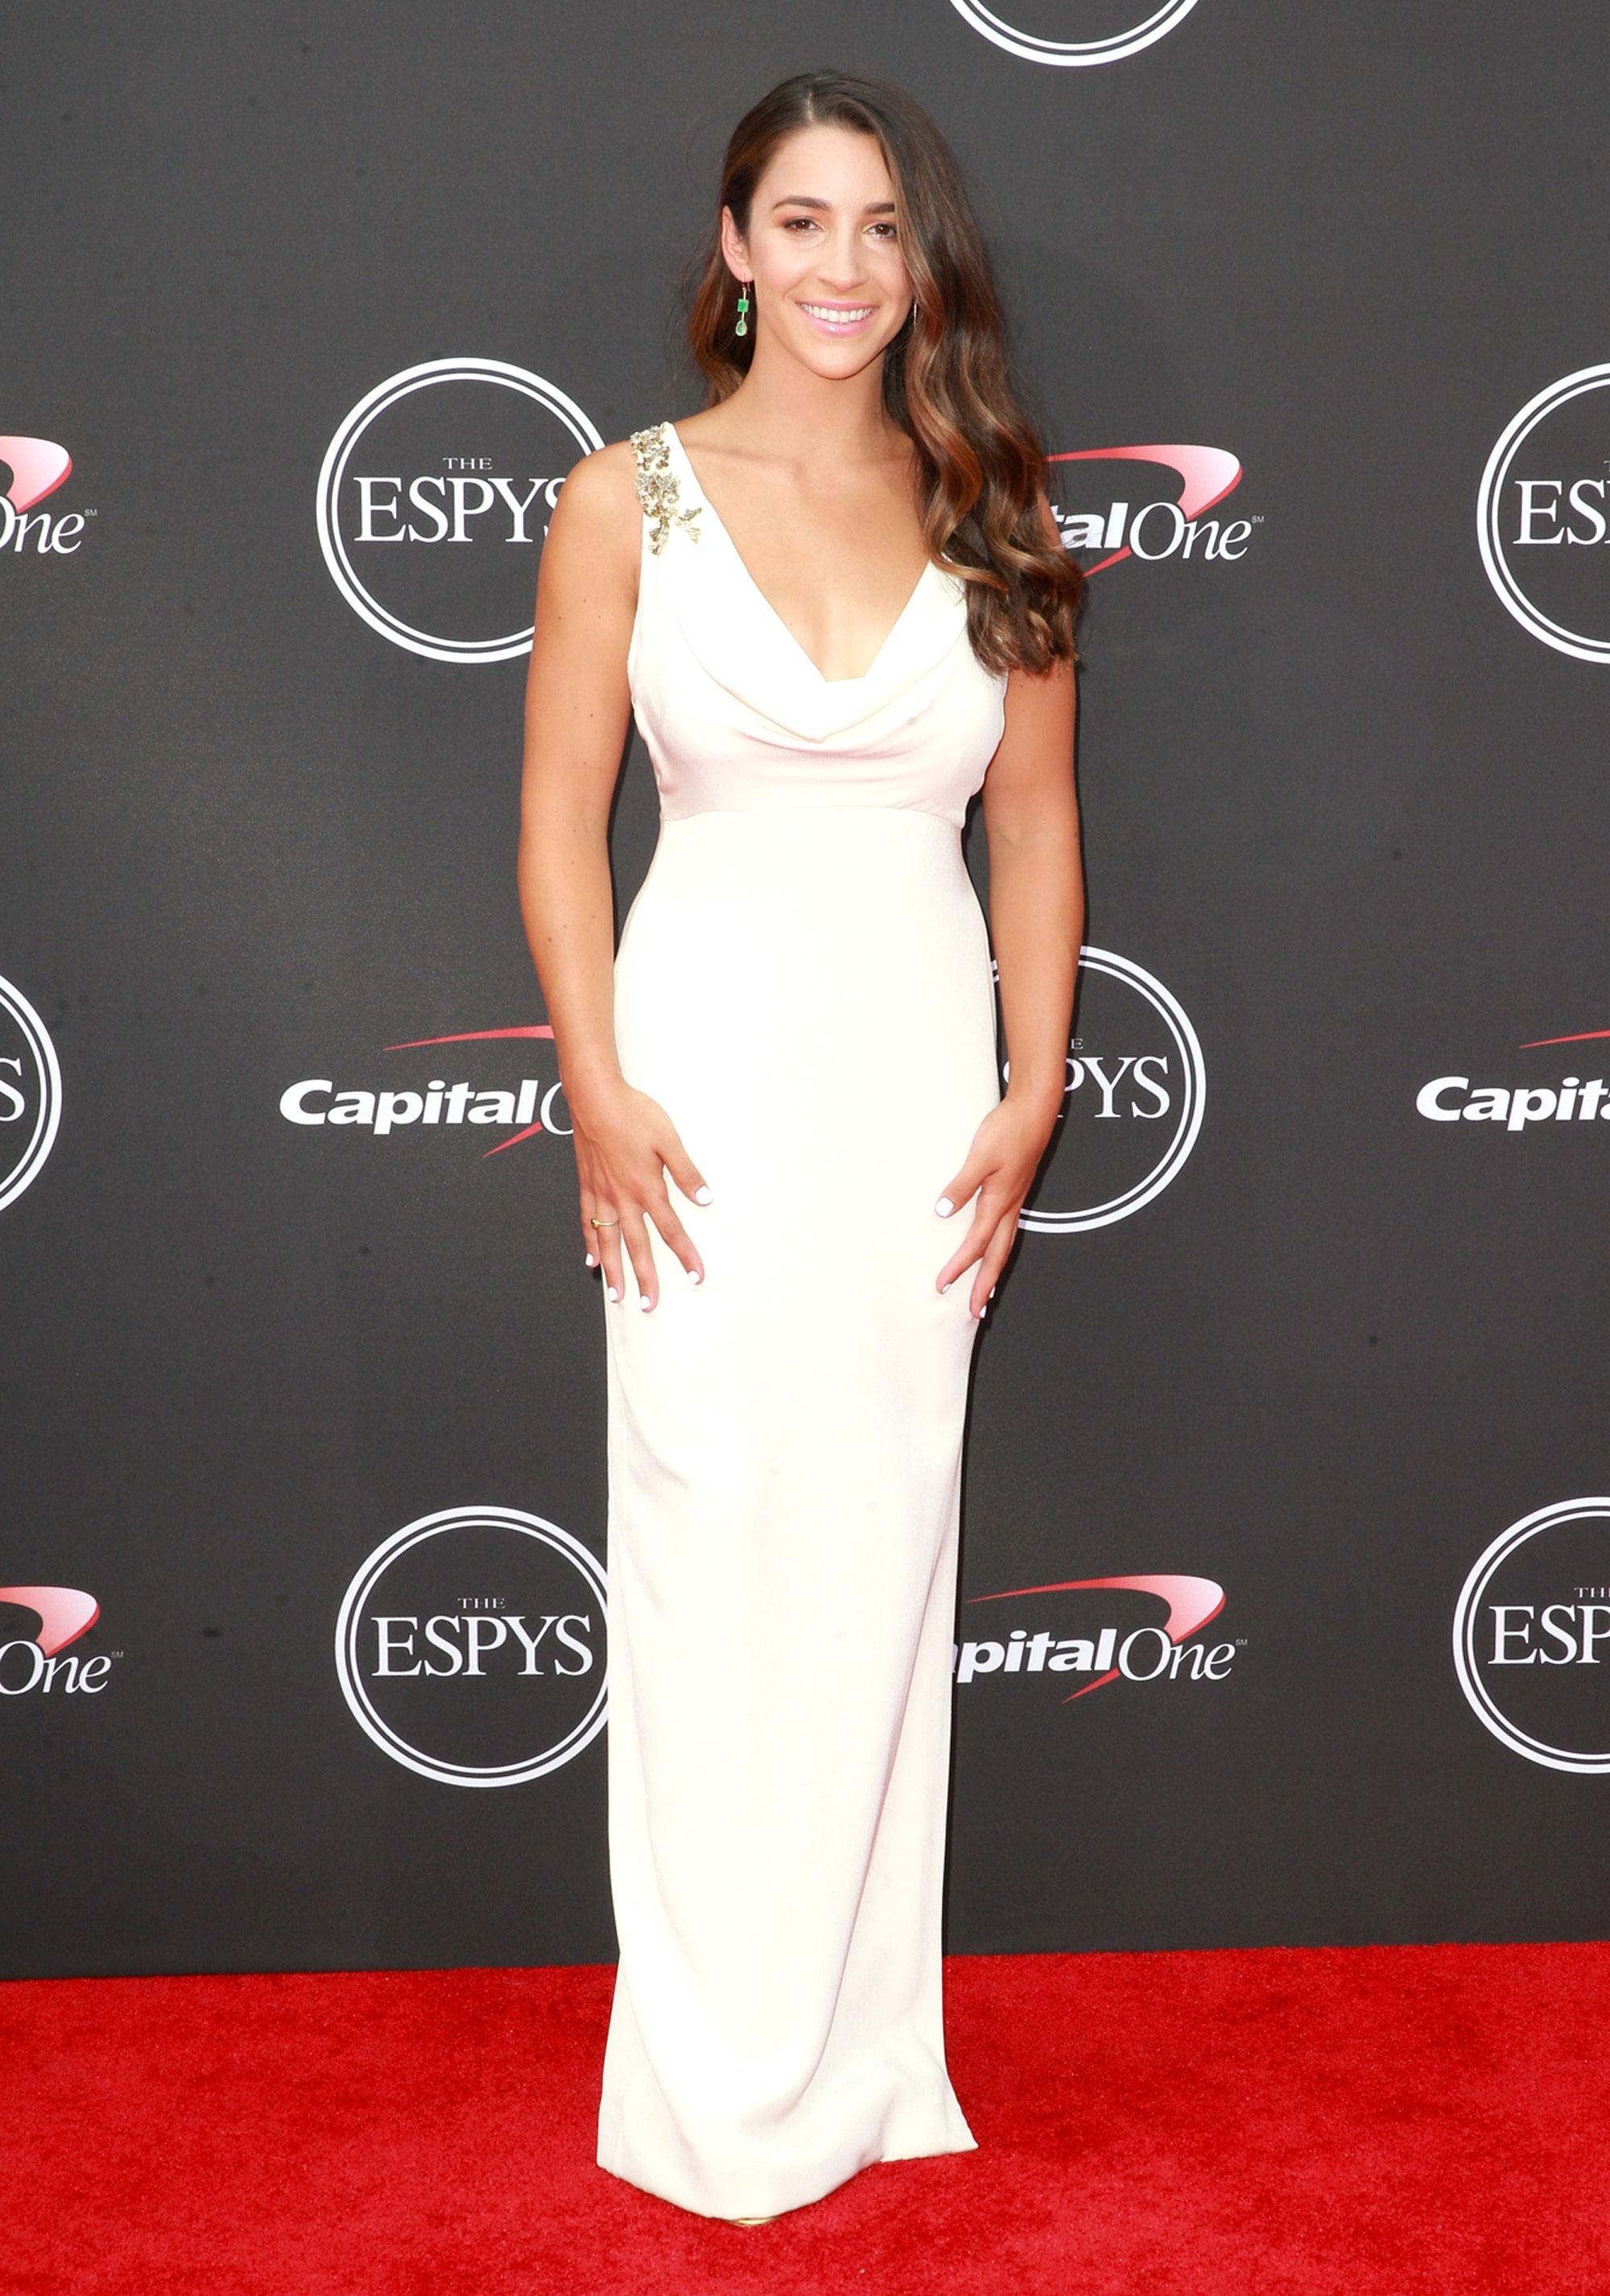 Aly-Raisman-espys - Wearing a white column gown with embellishment along the neckline.